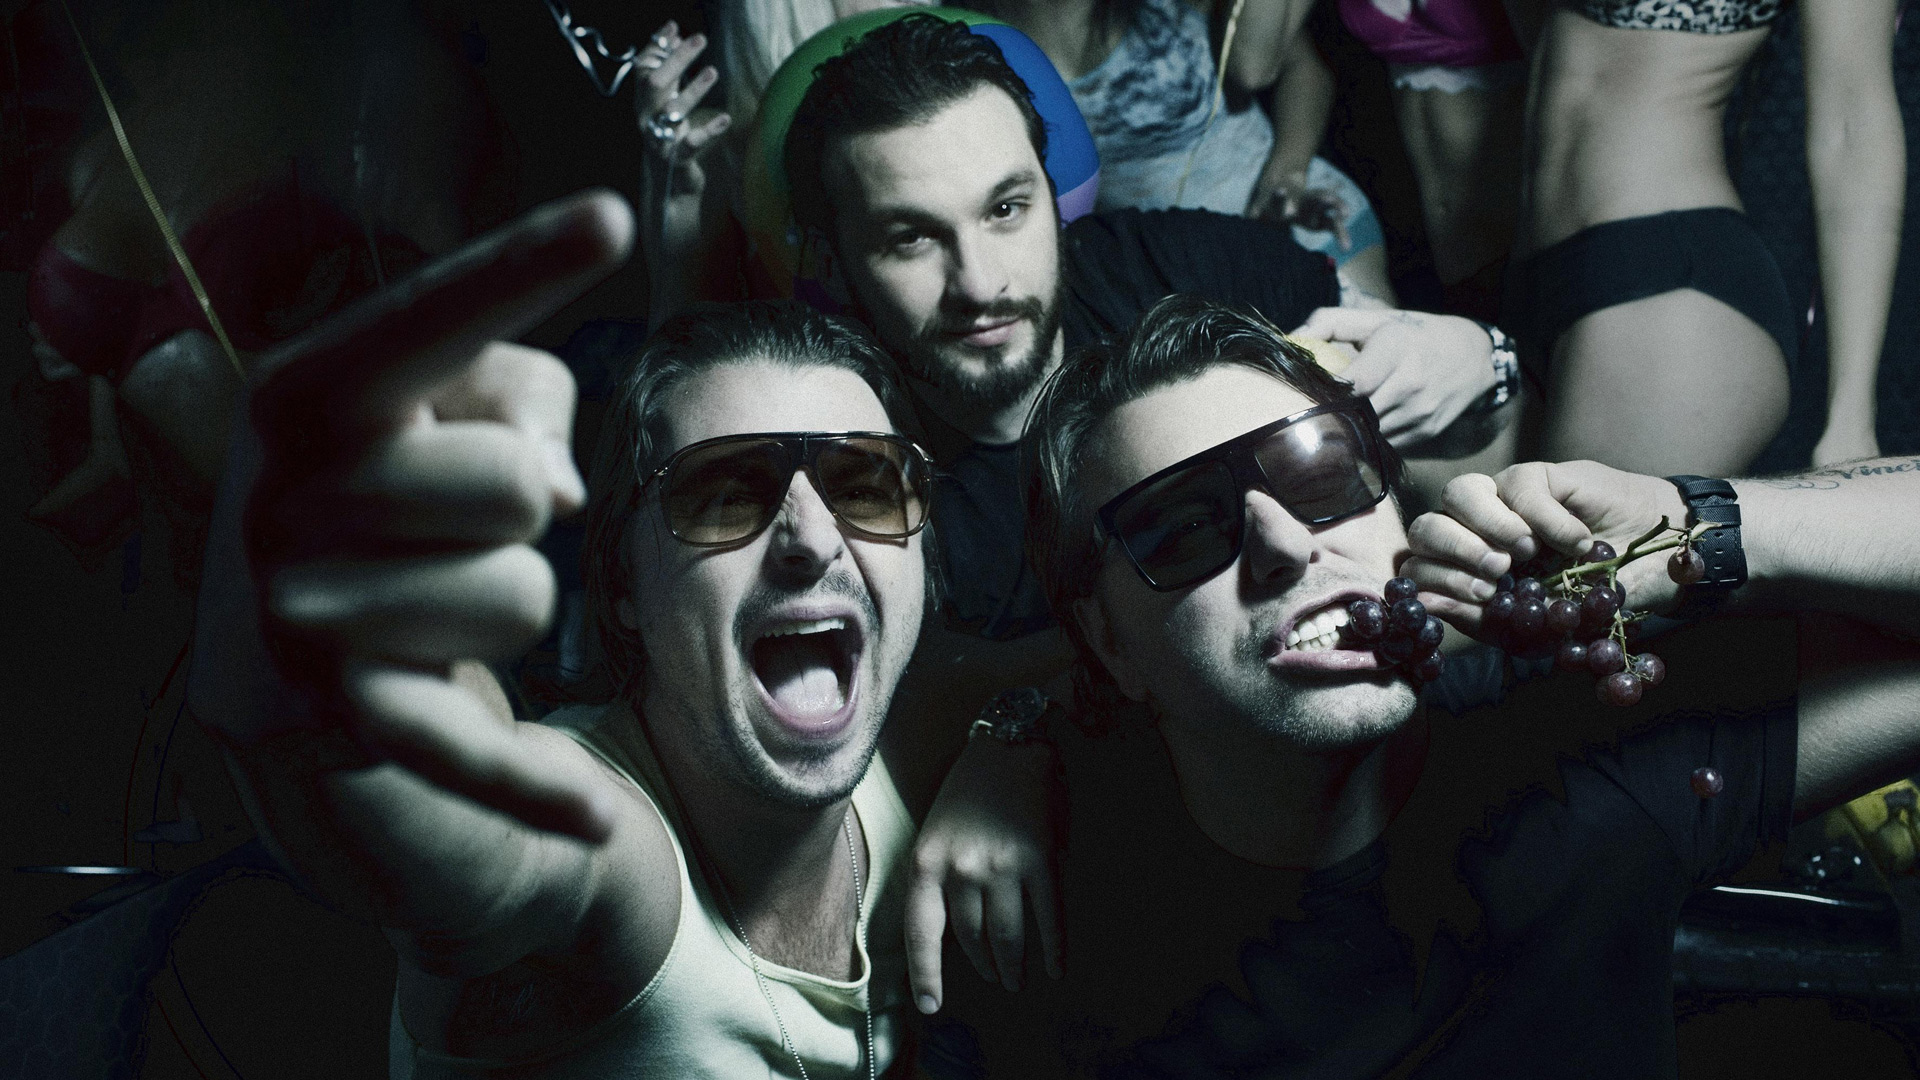 Swedish House Mafia Hd Wallpapers Conoce A Swedish House Mafia Be Tronic Music